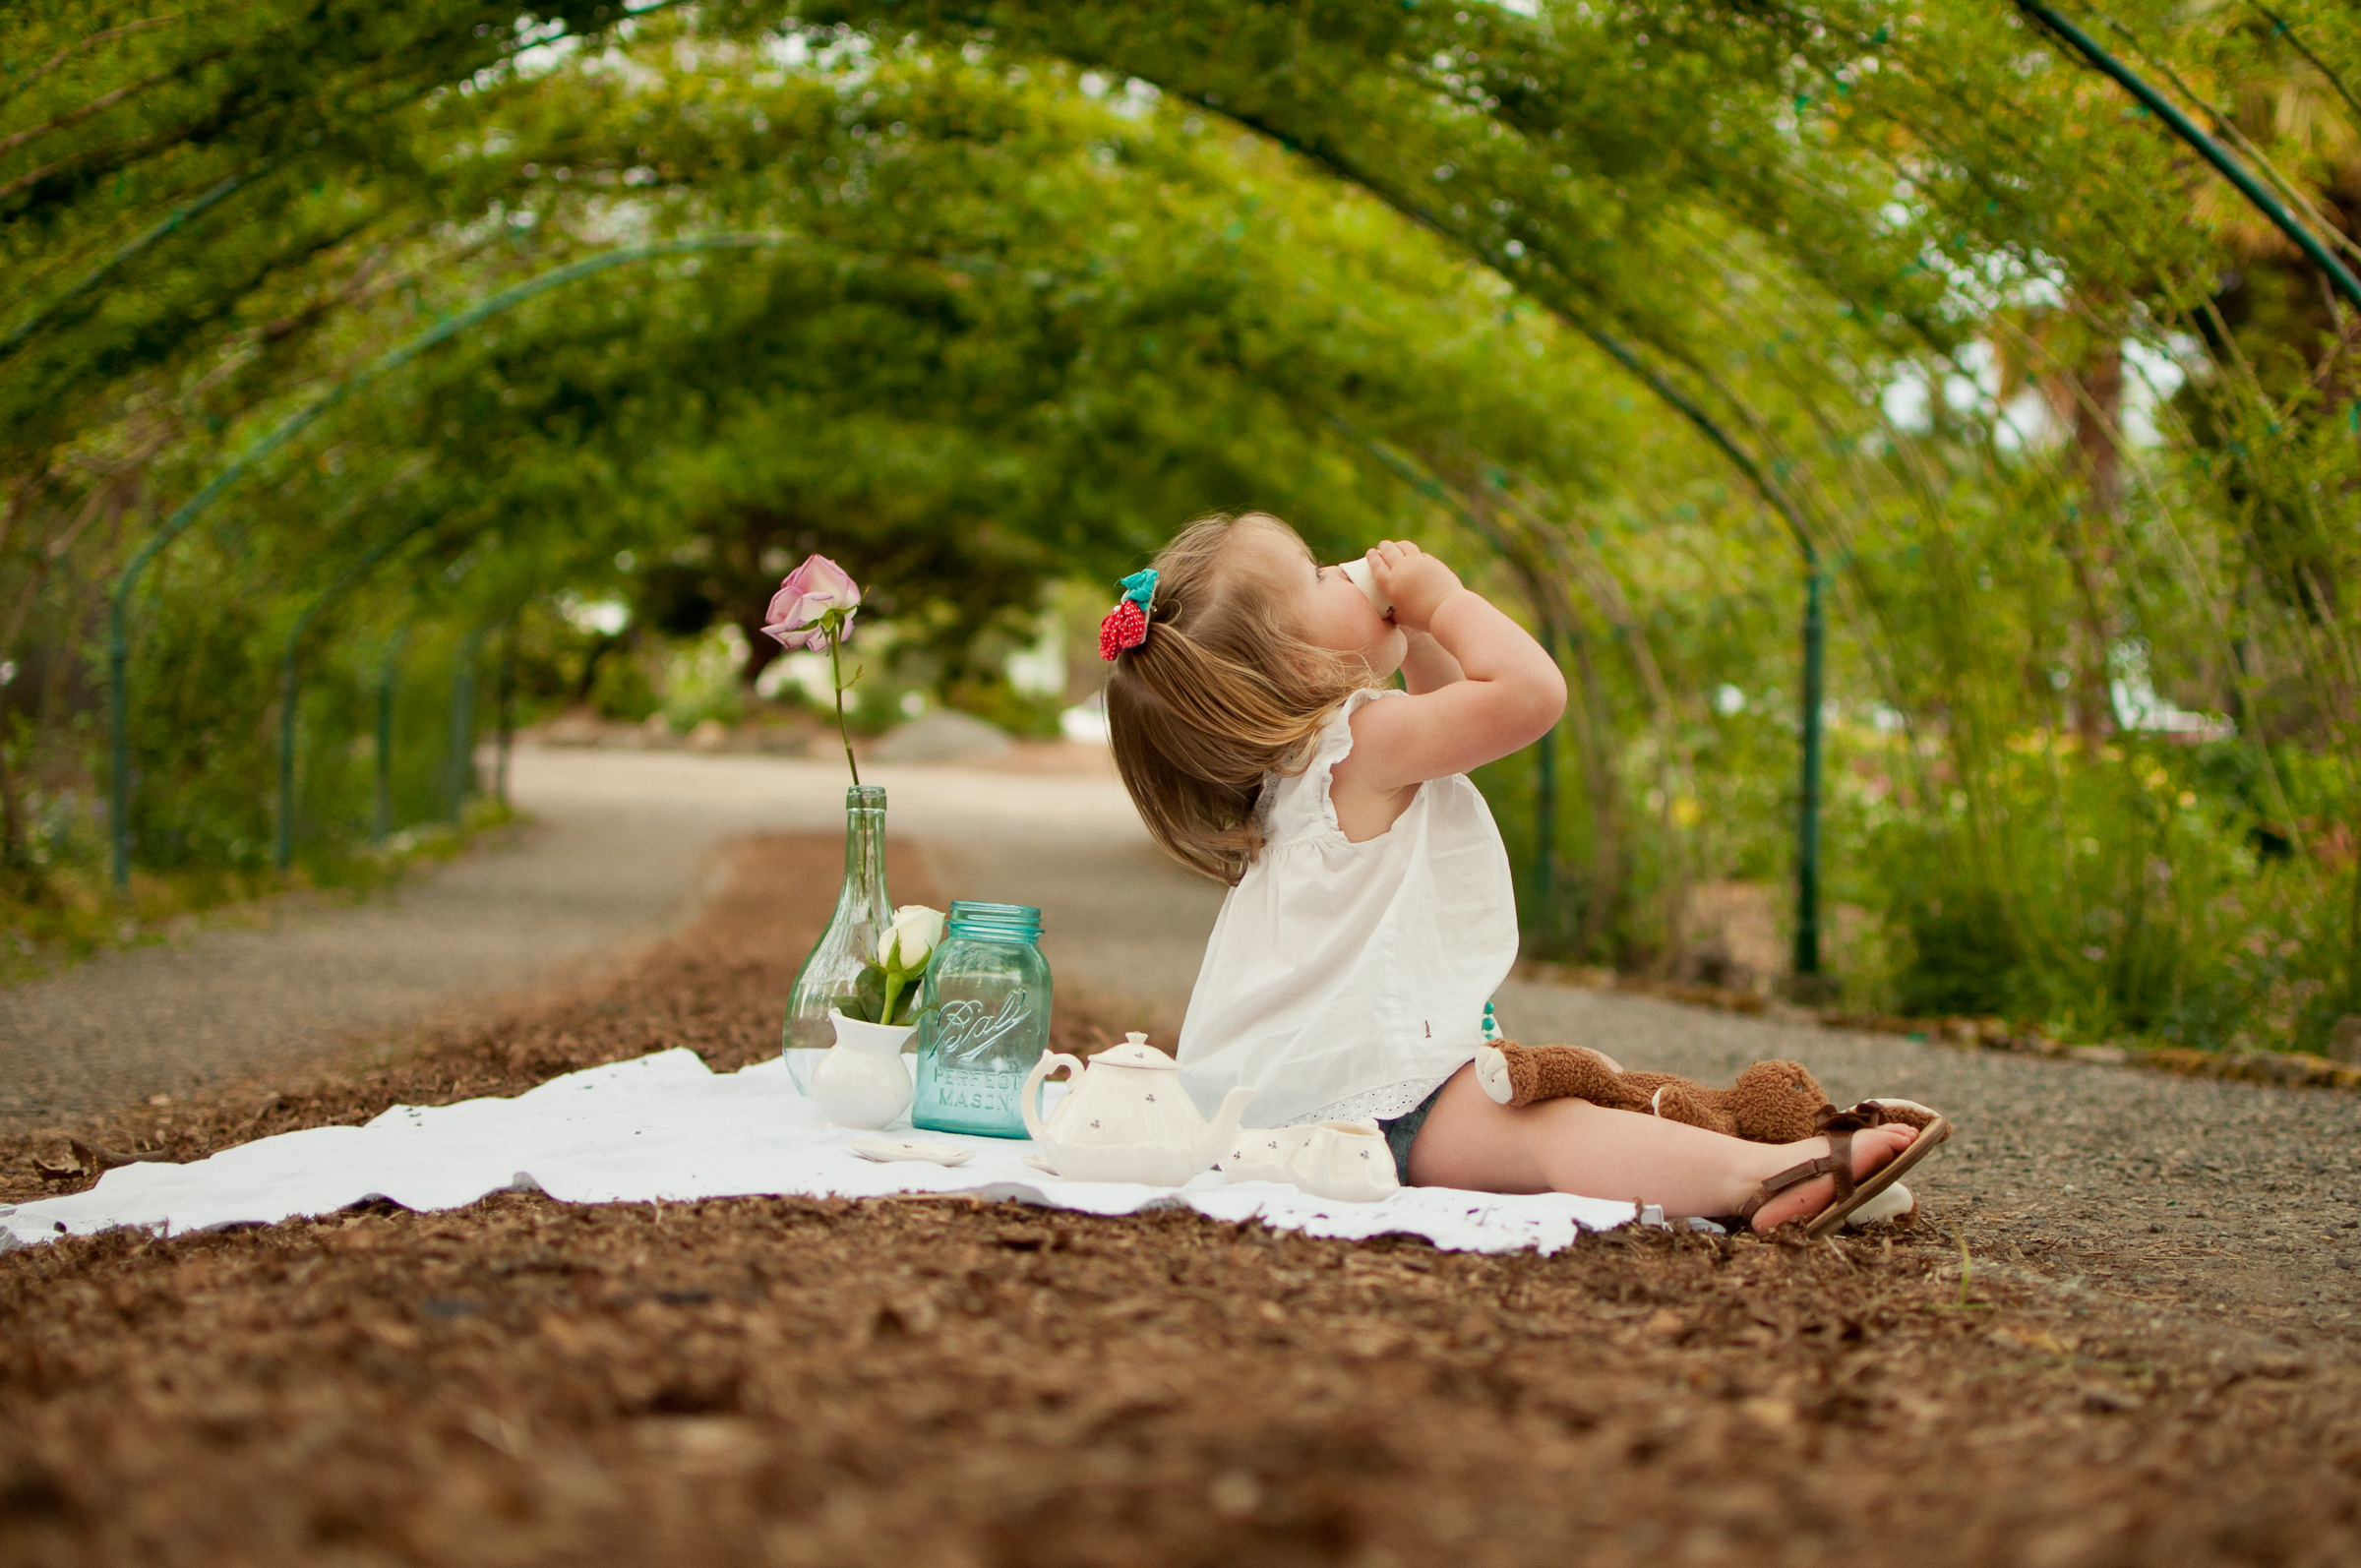 Baby girl picnic